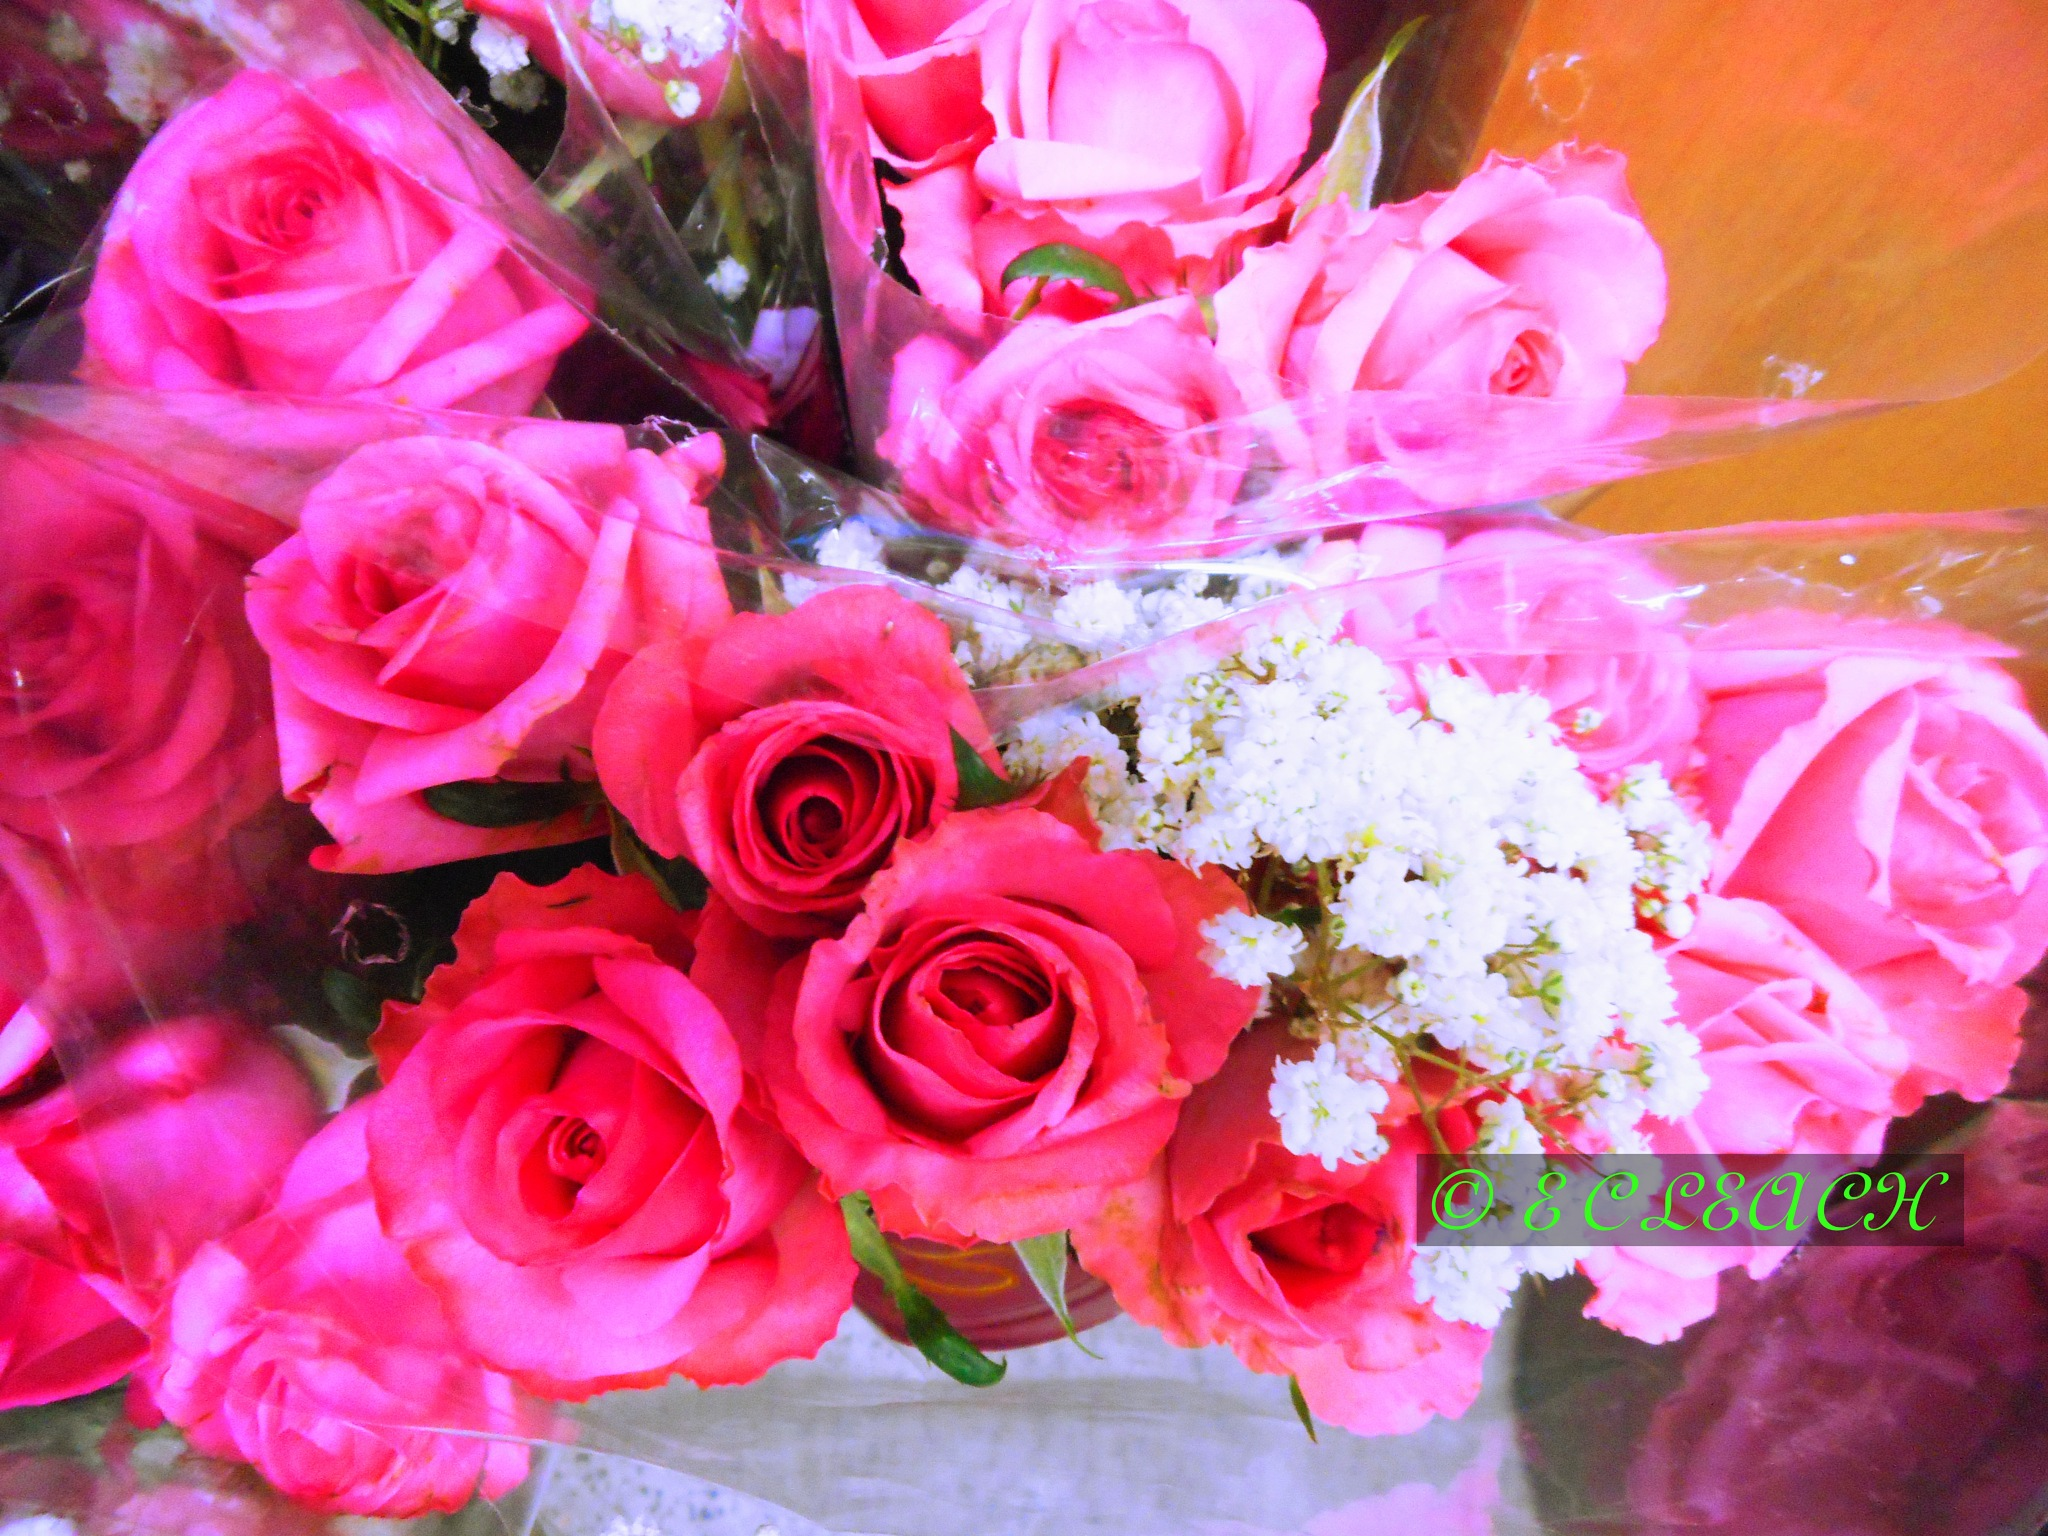 I'm Sending You A Big Bouquet of Roses by Elmer Leach